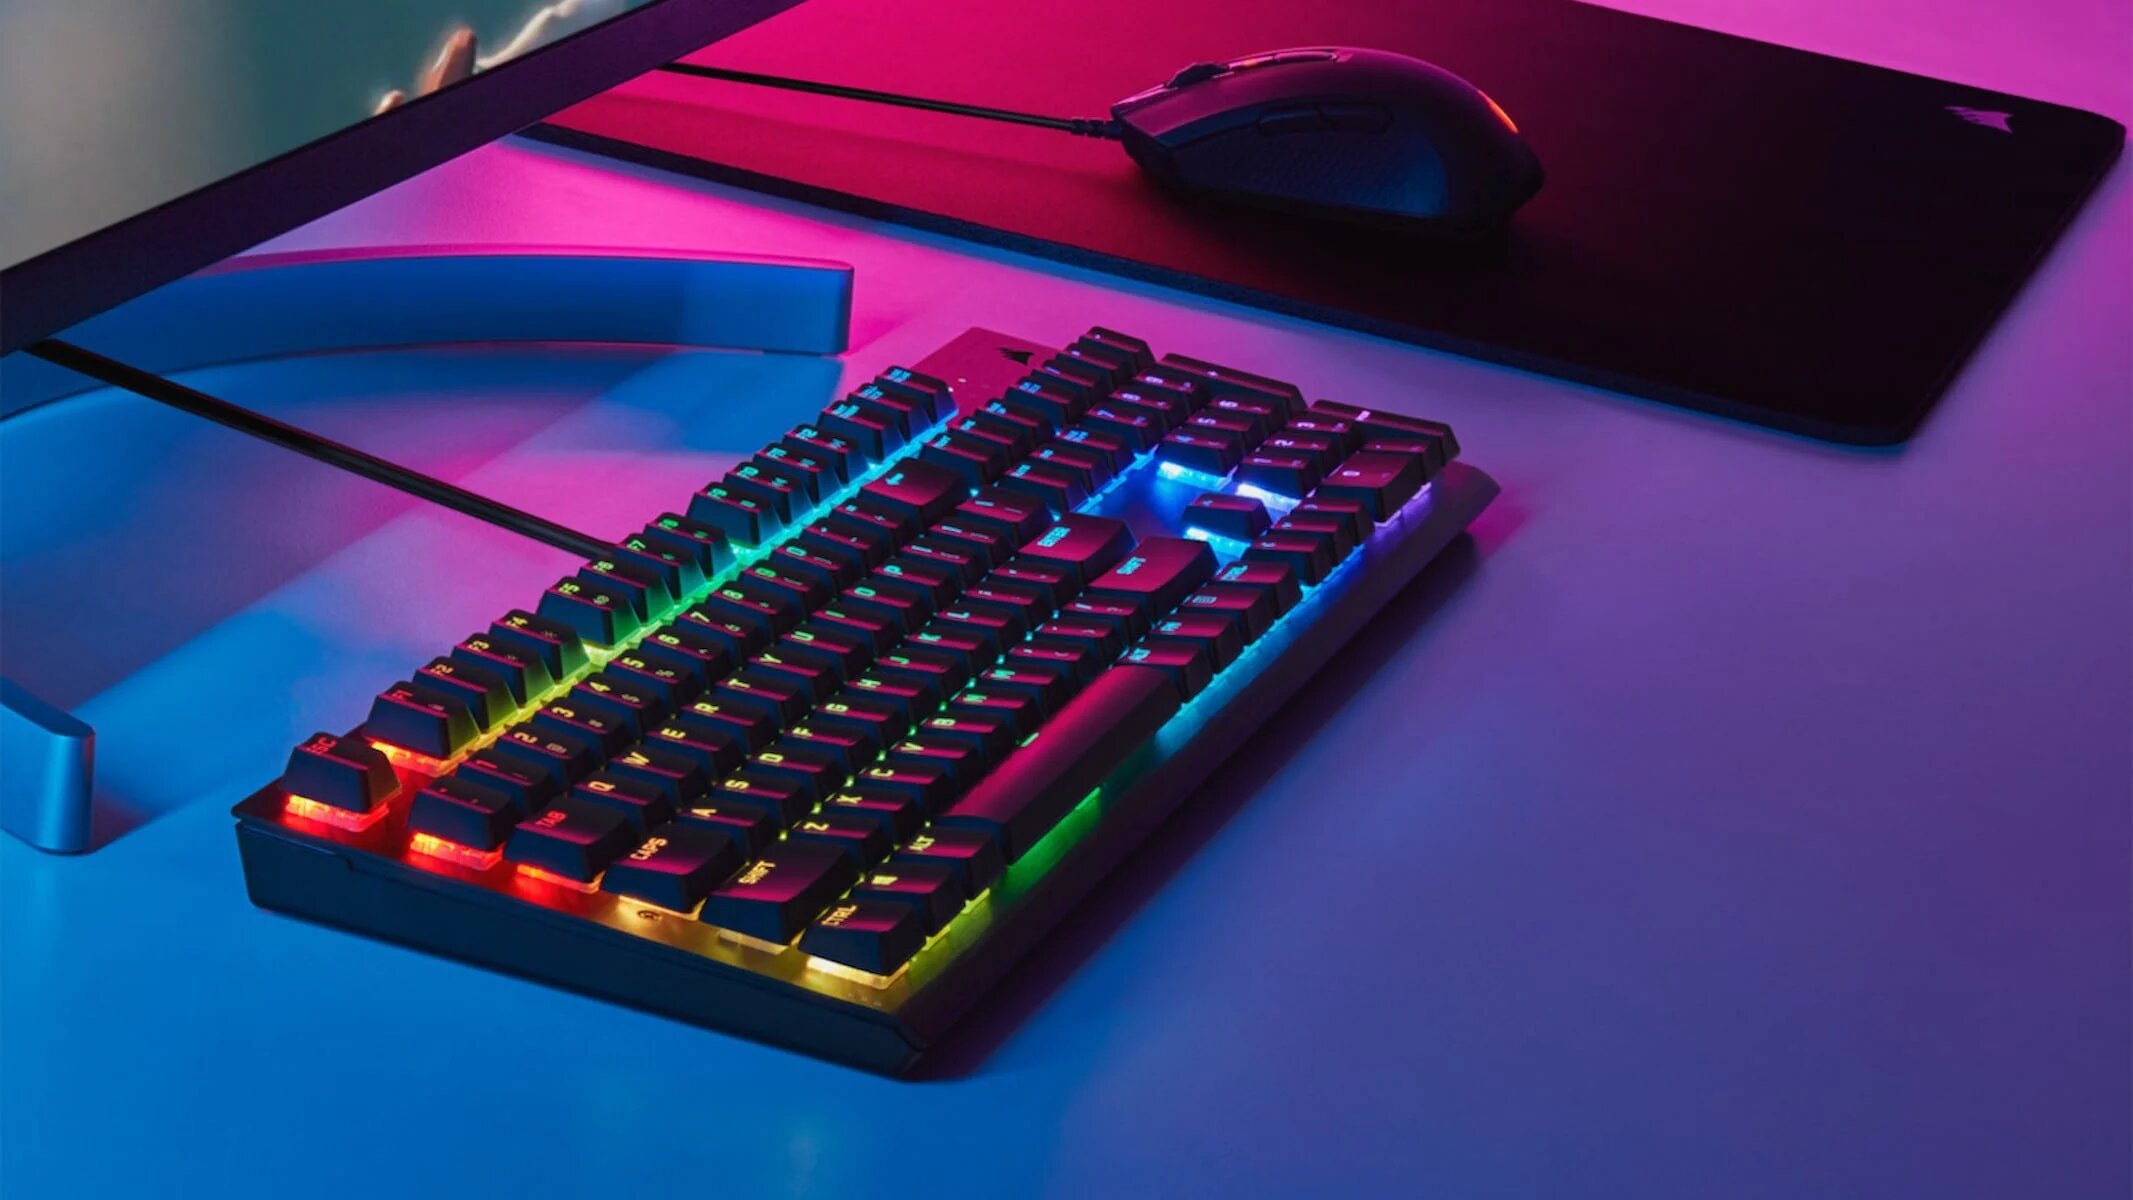 Best-best-gaming-keyboards